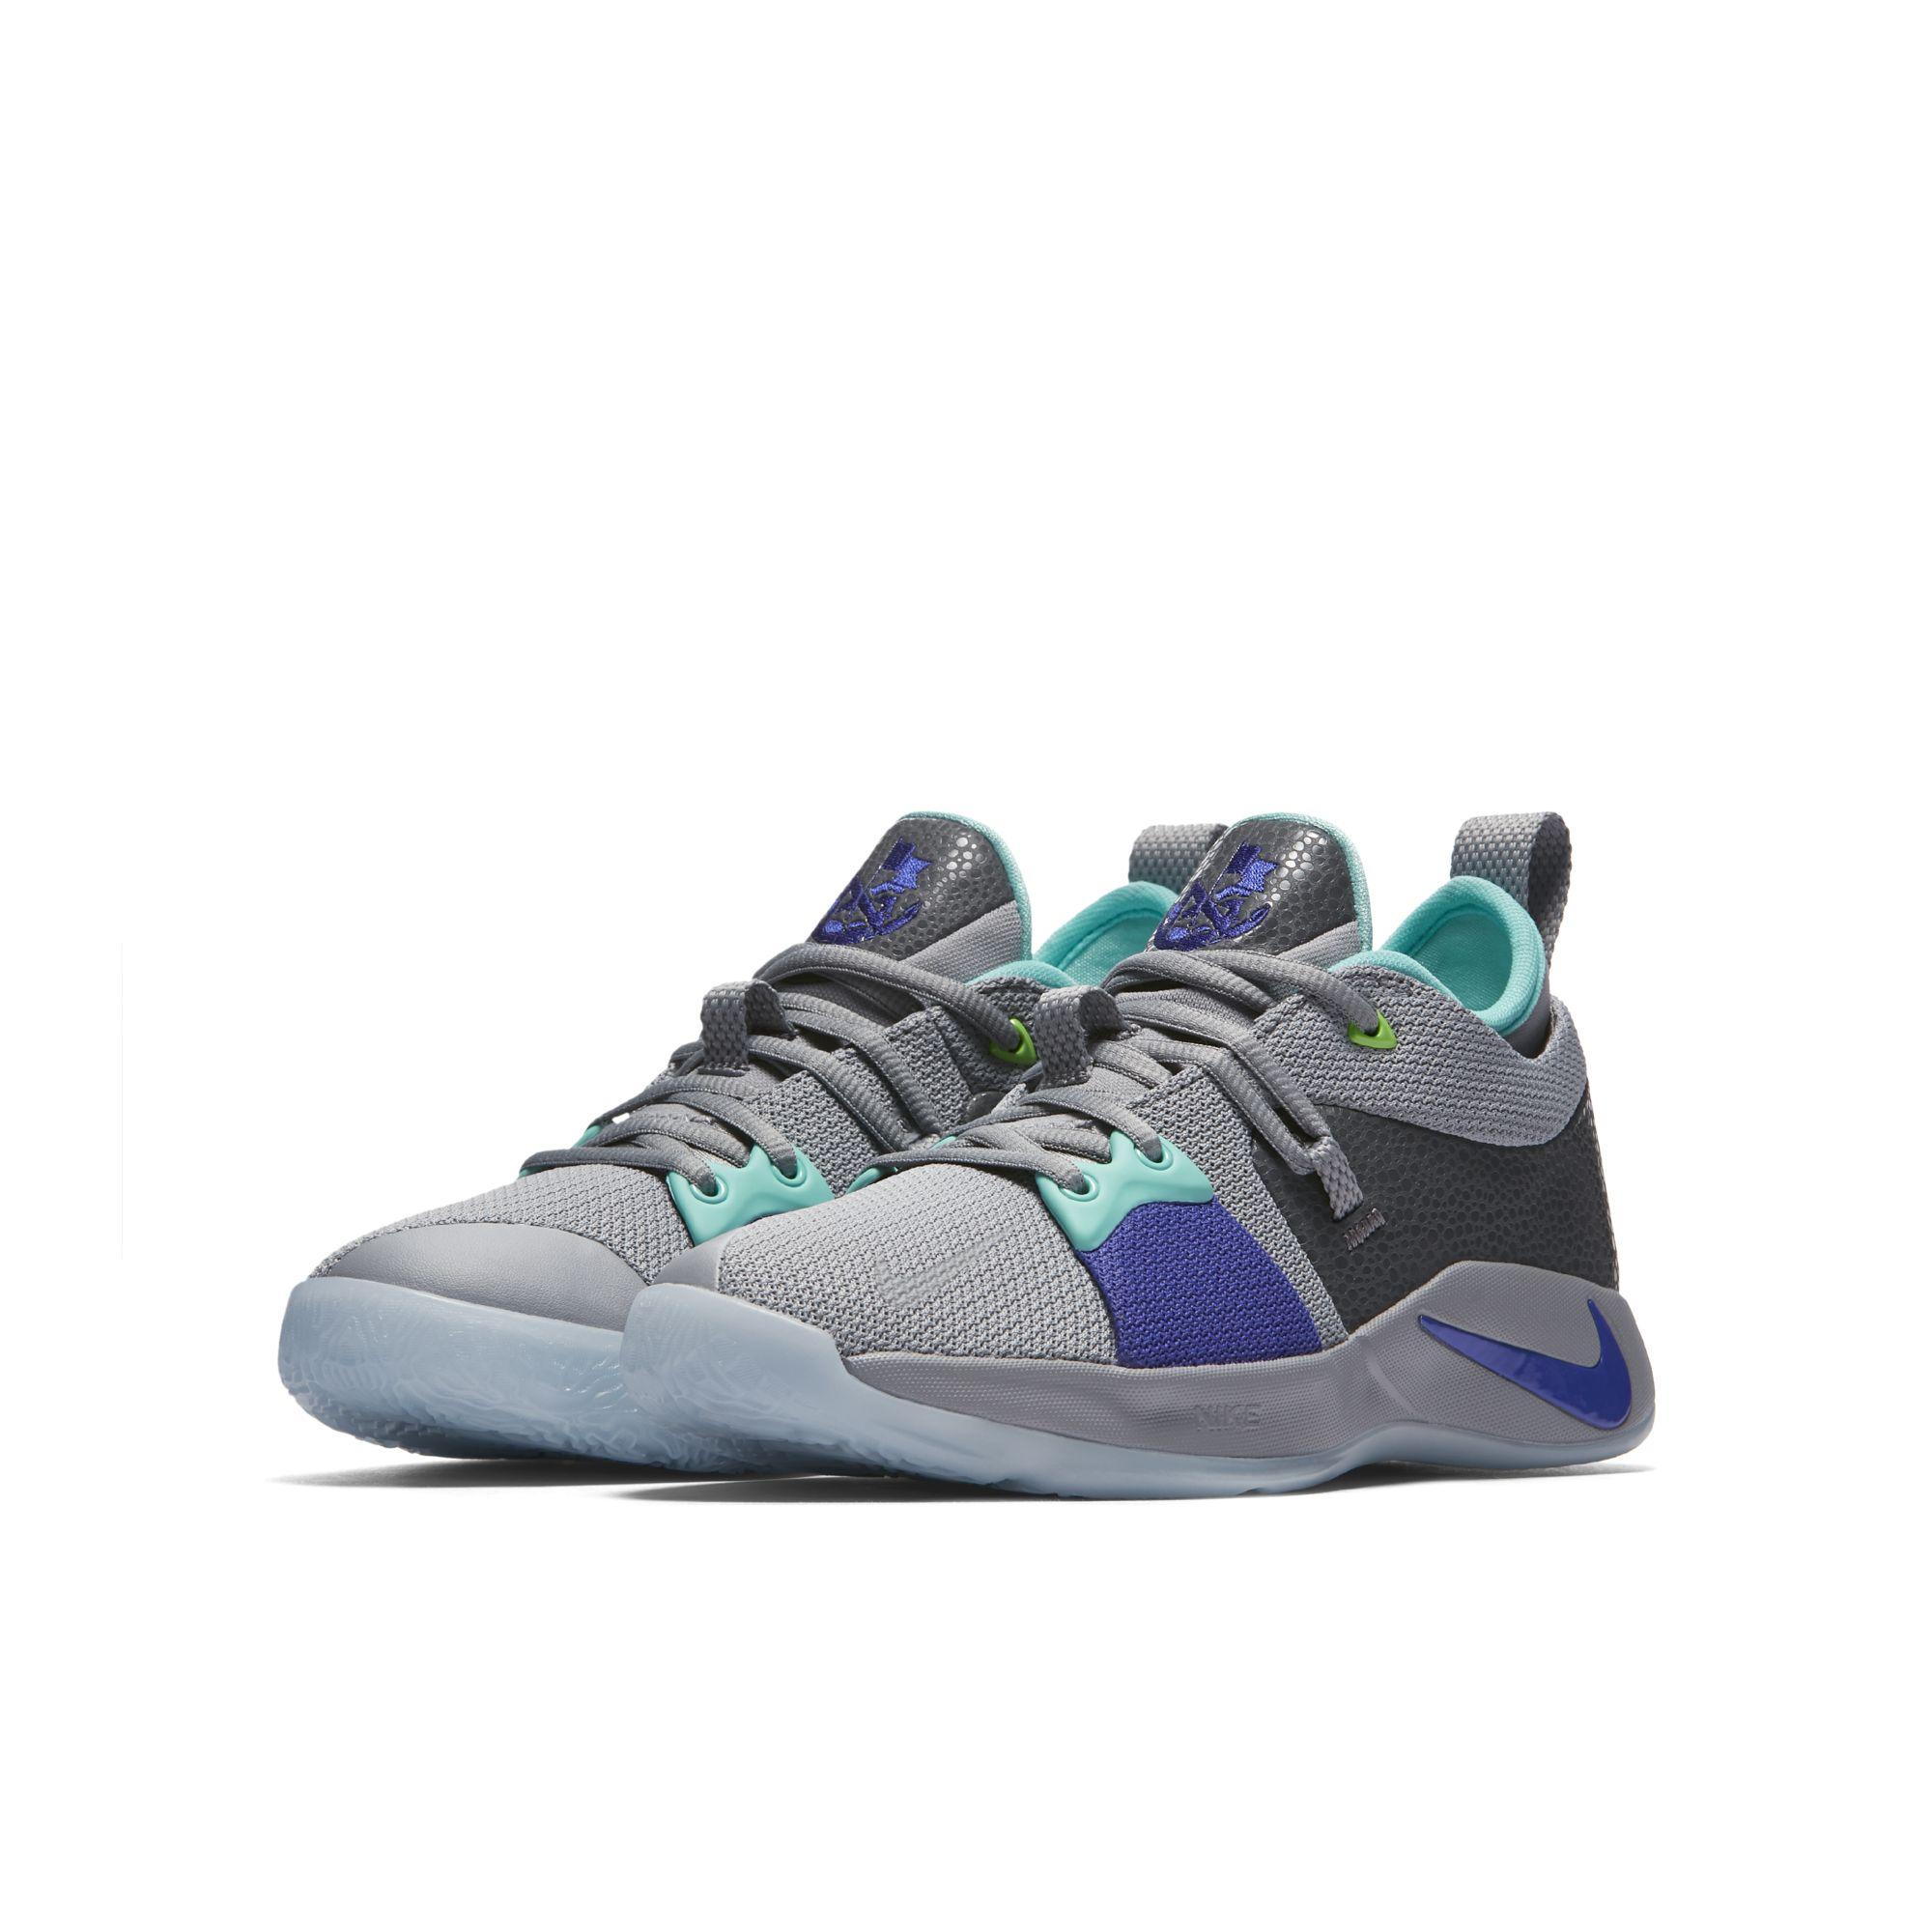 Nike PG 2 PURE PLATINUM GS 2